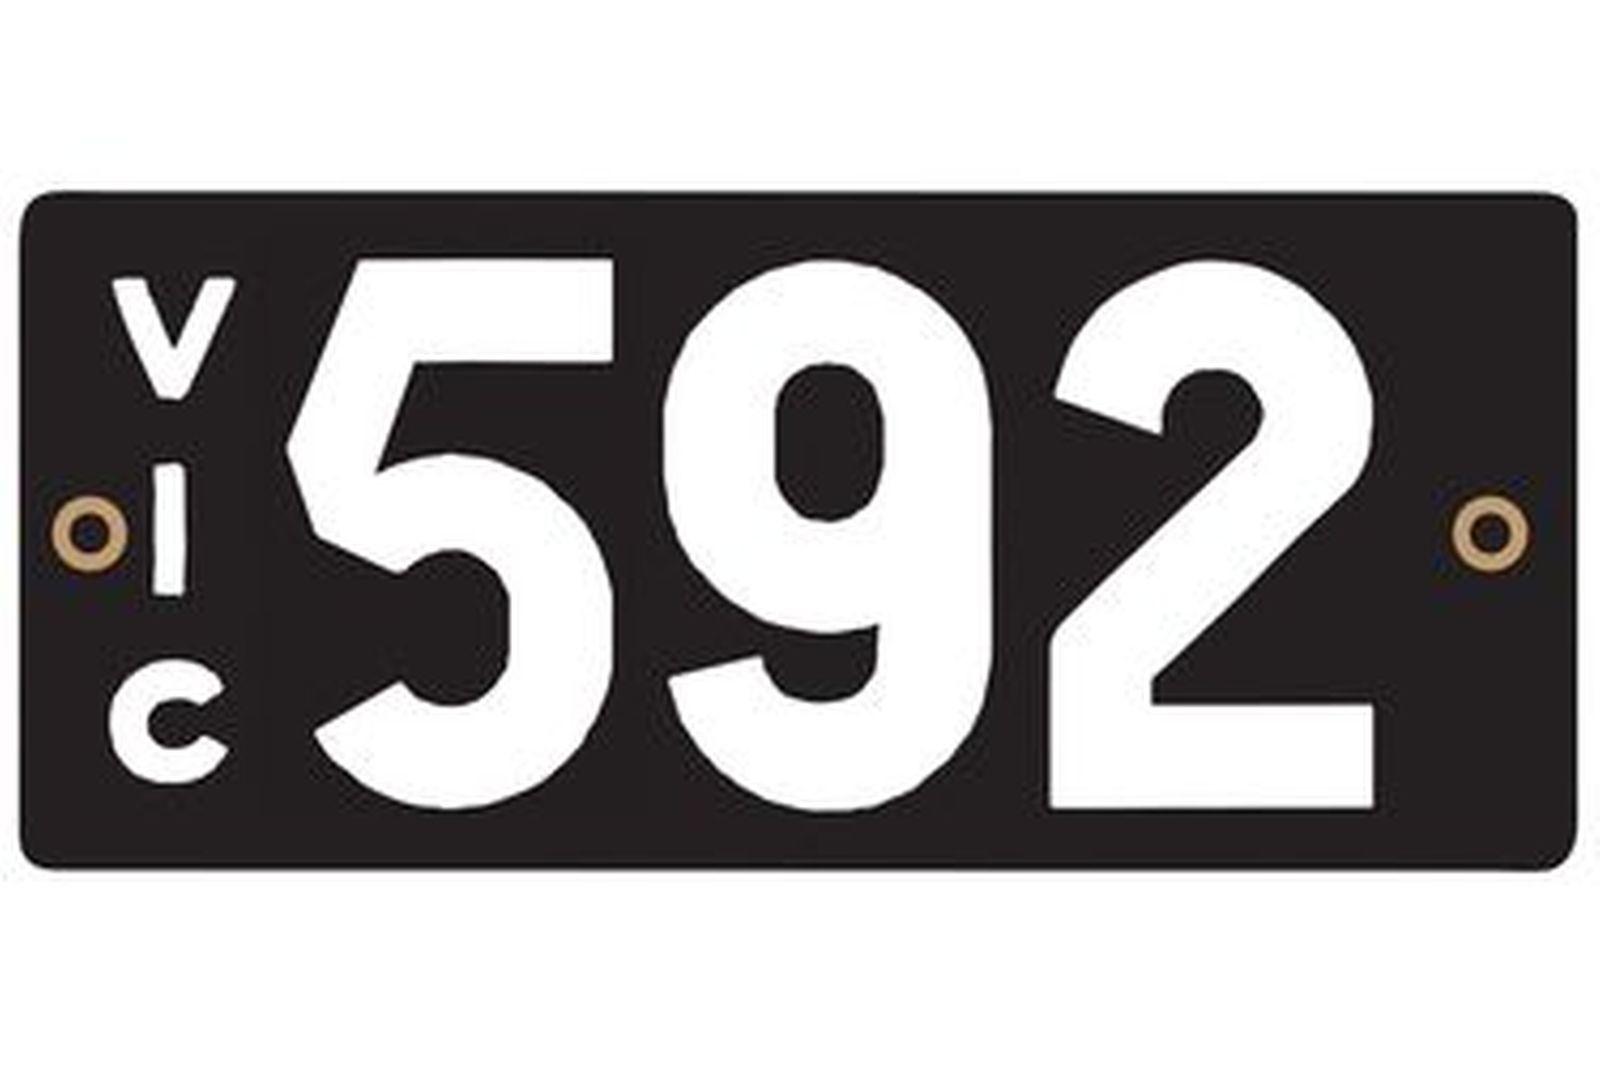 Victorian Heritage Plate '592'